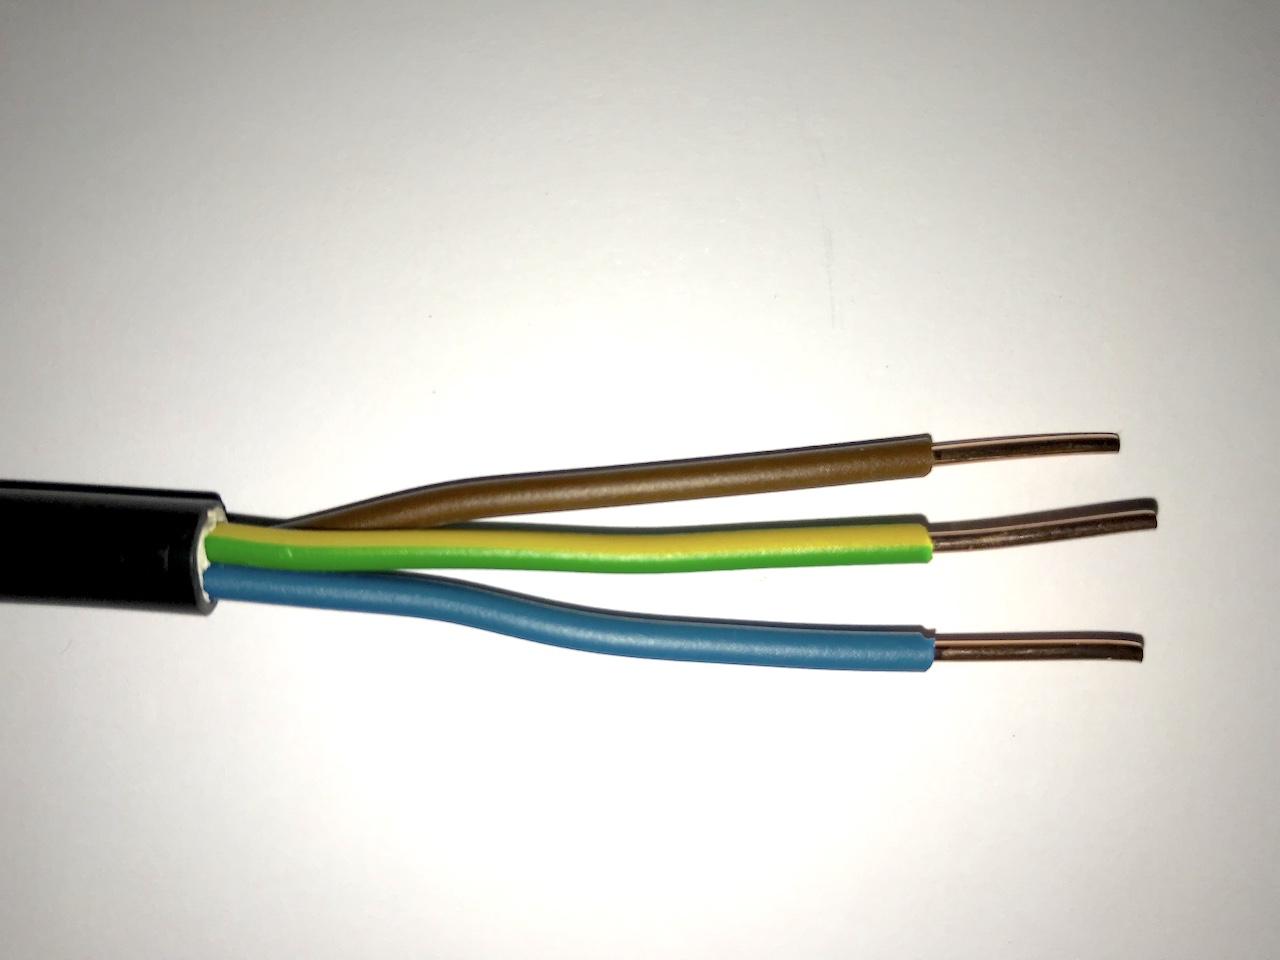 Kabel CYKY-J 3x2,5